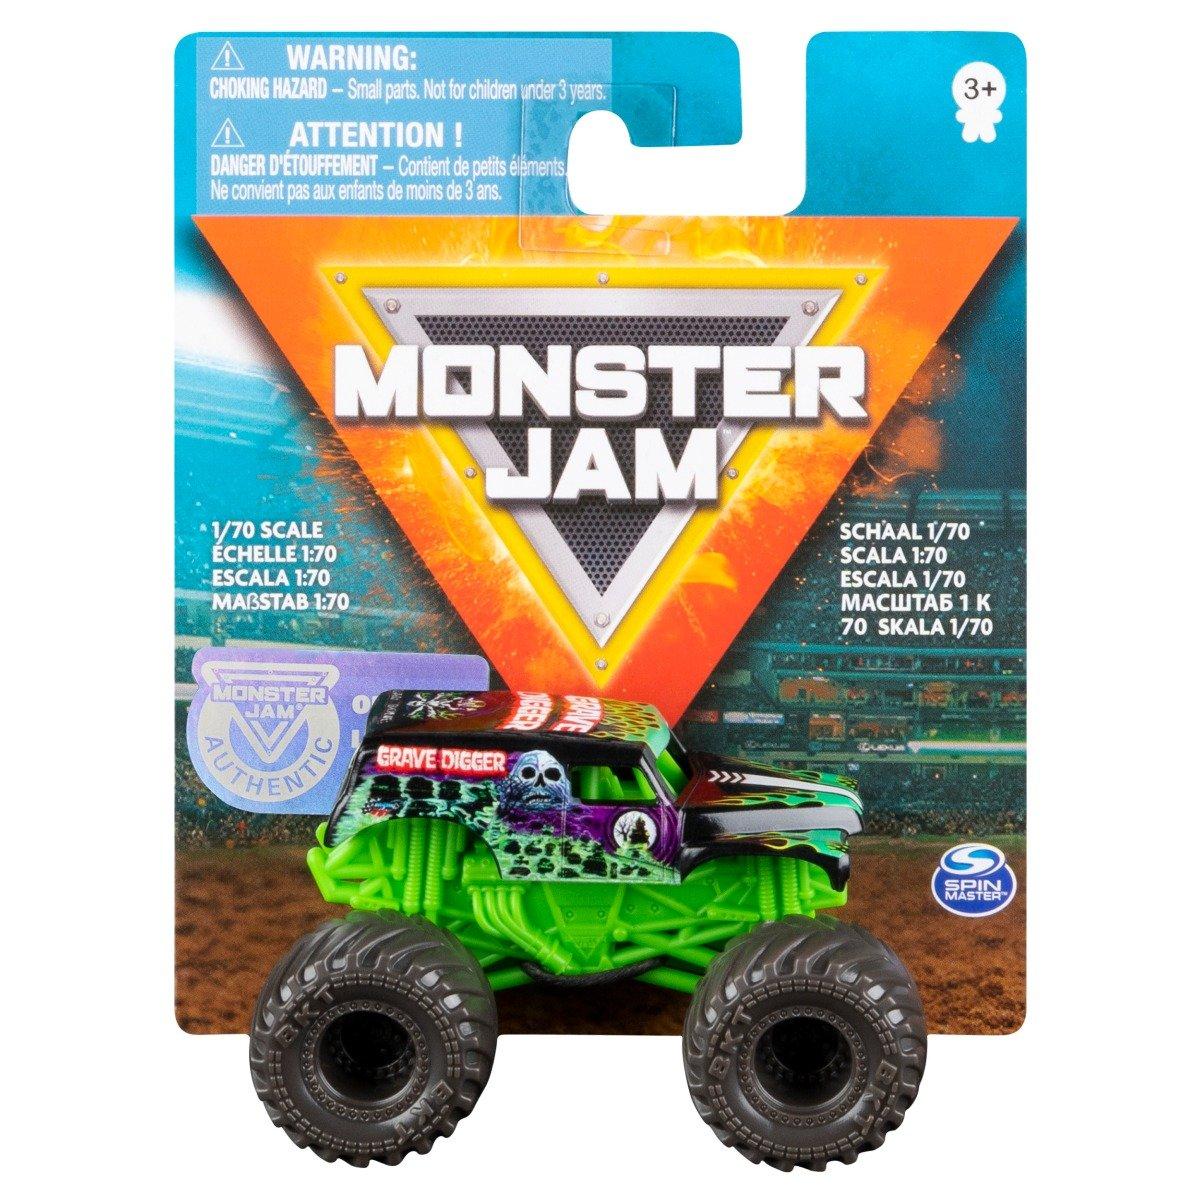 Masinuta Monster Jam 1:70, Grave Digger, 20126425